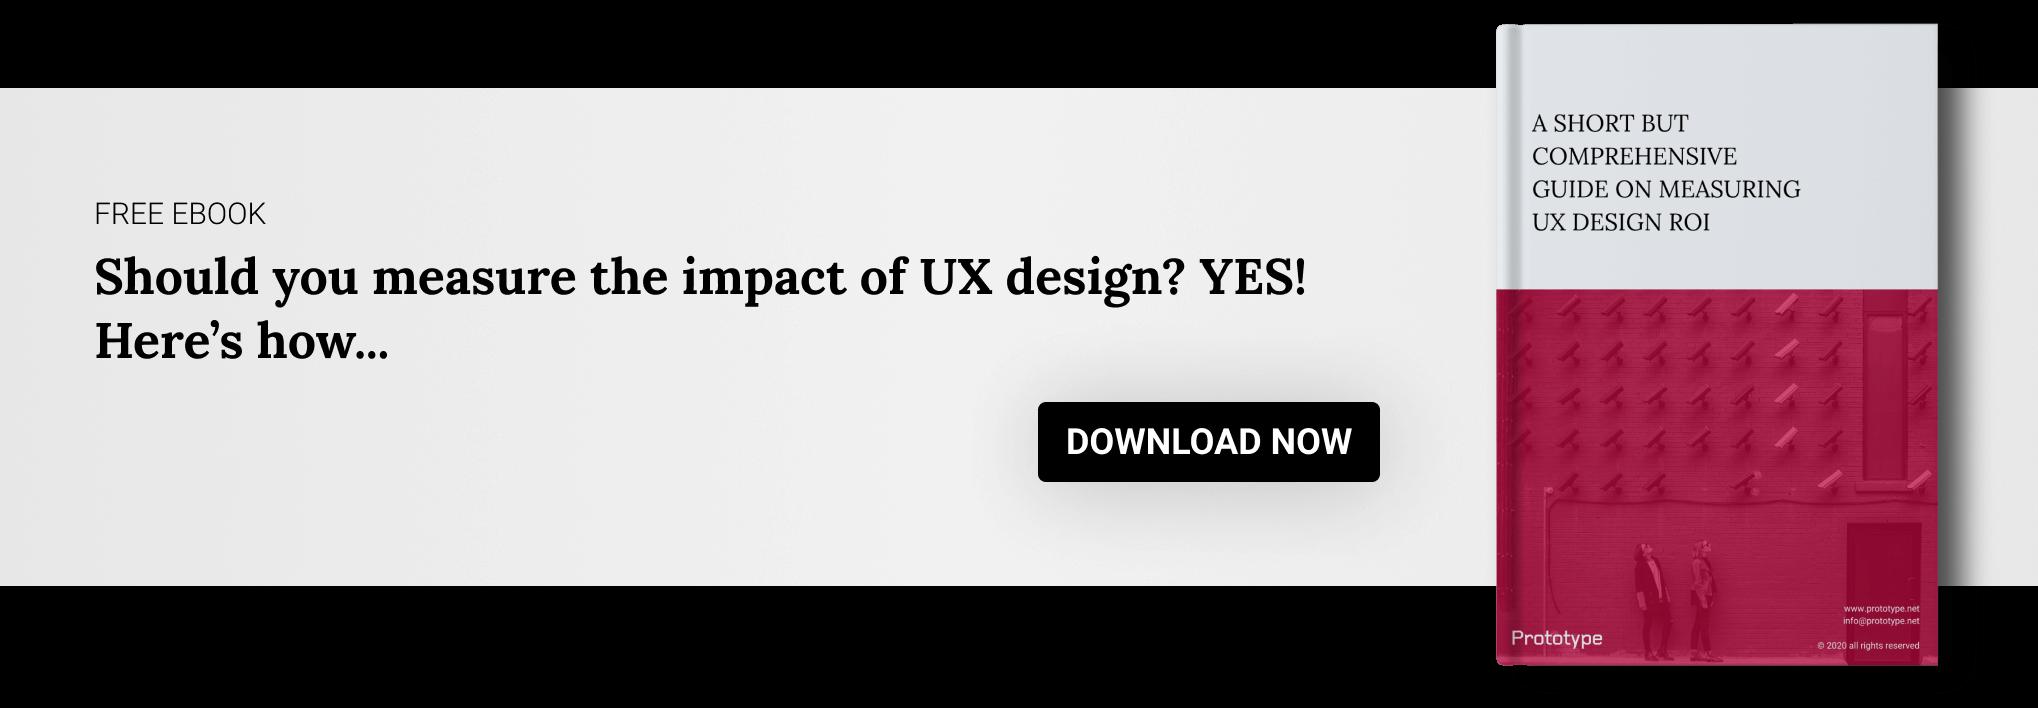 A Short But Comprehensive Guide on Measuring UX Design ROI CTA Banner